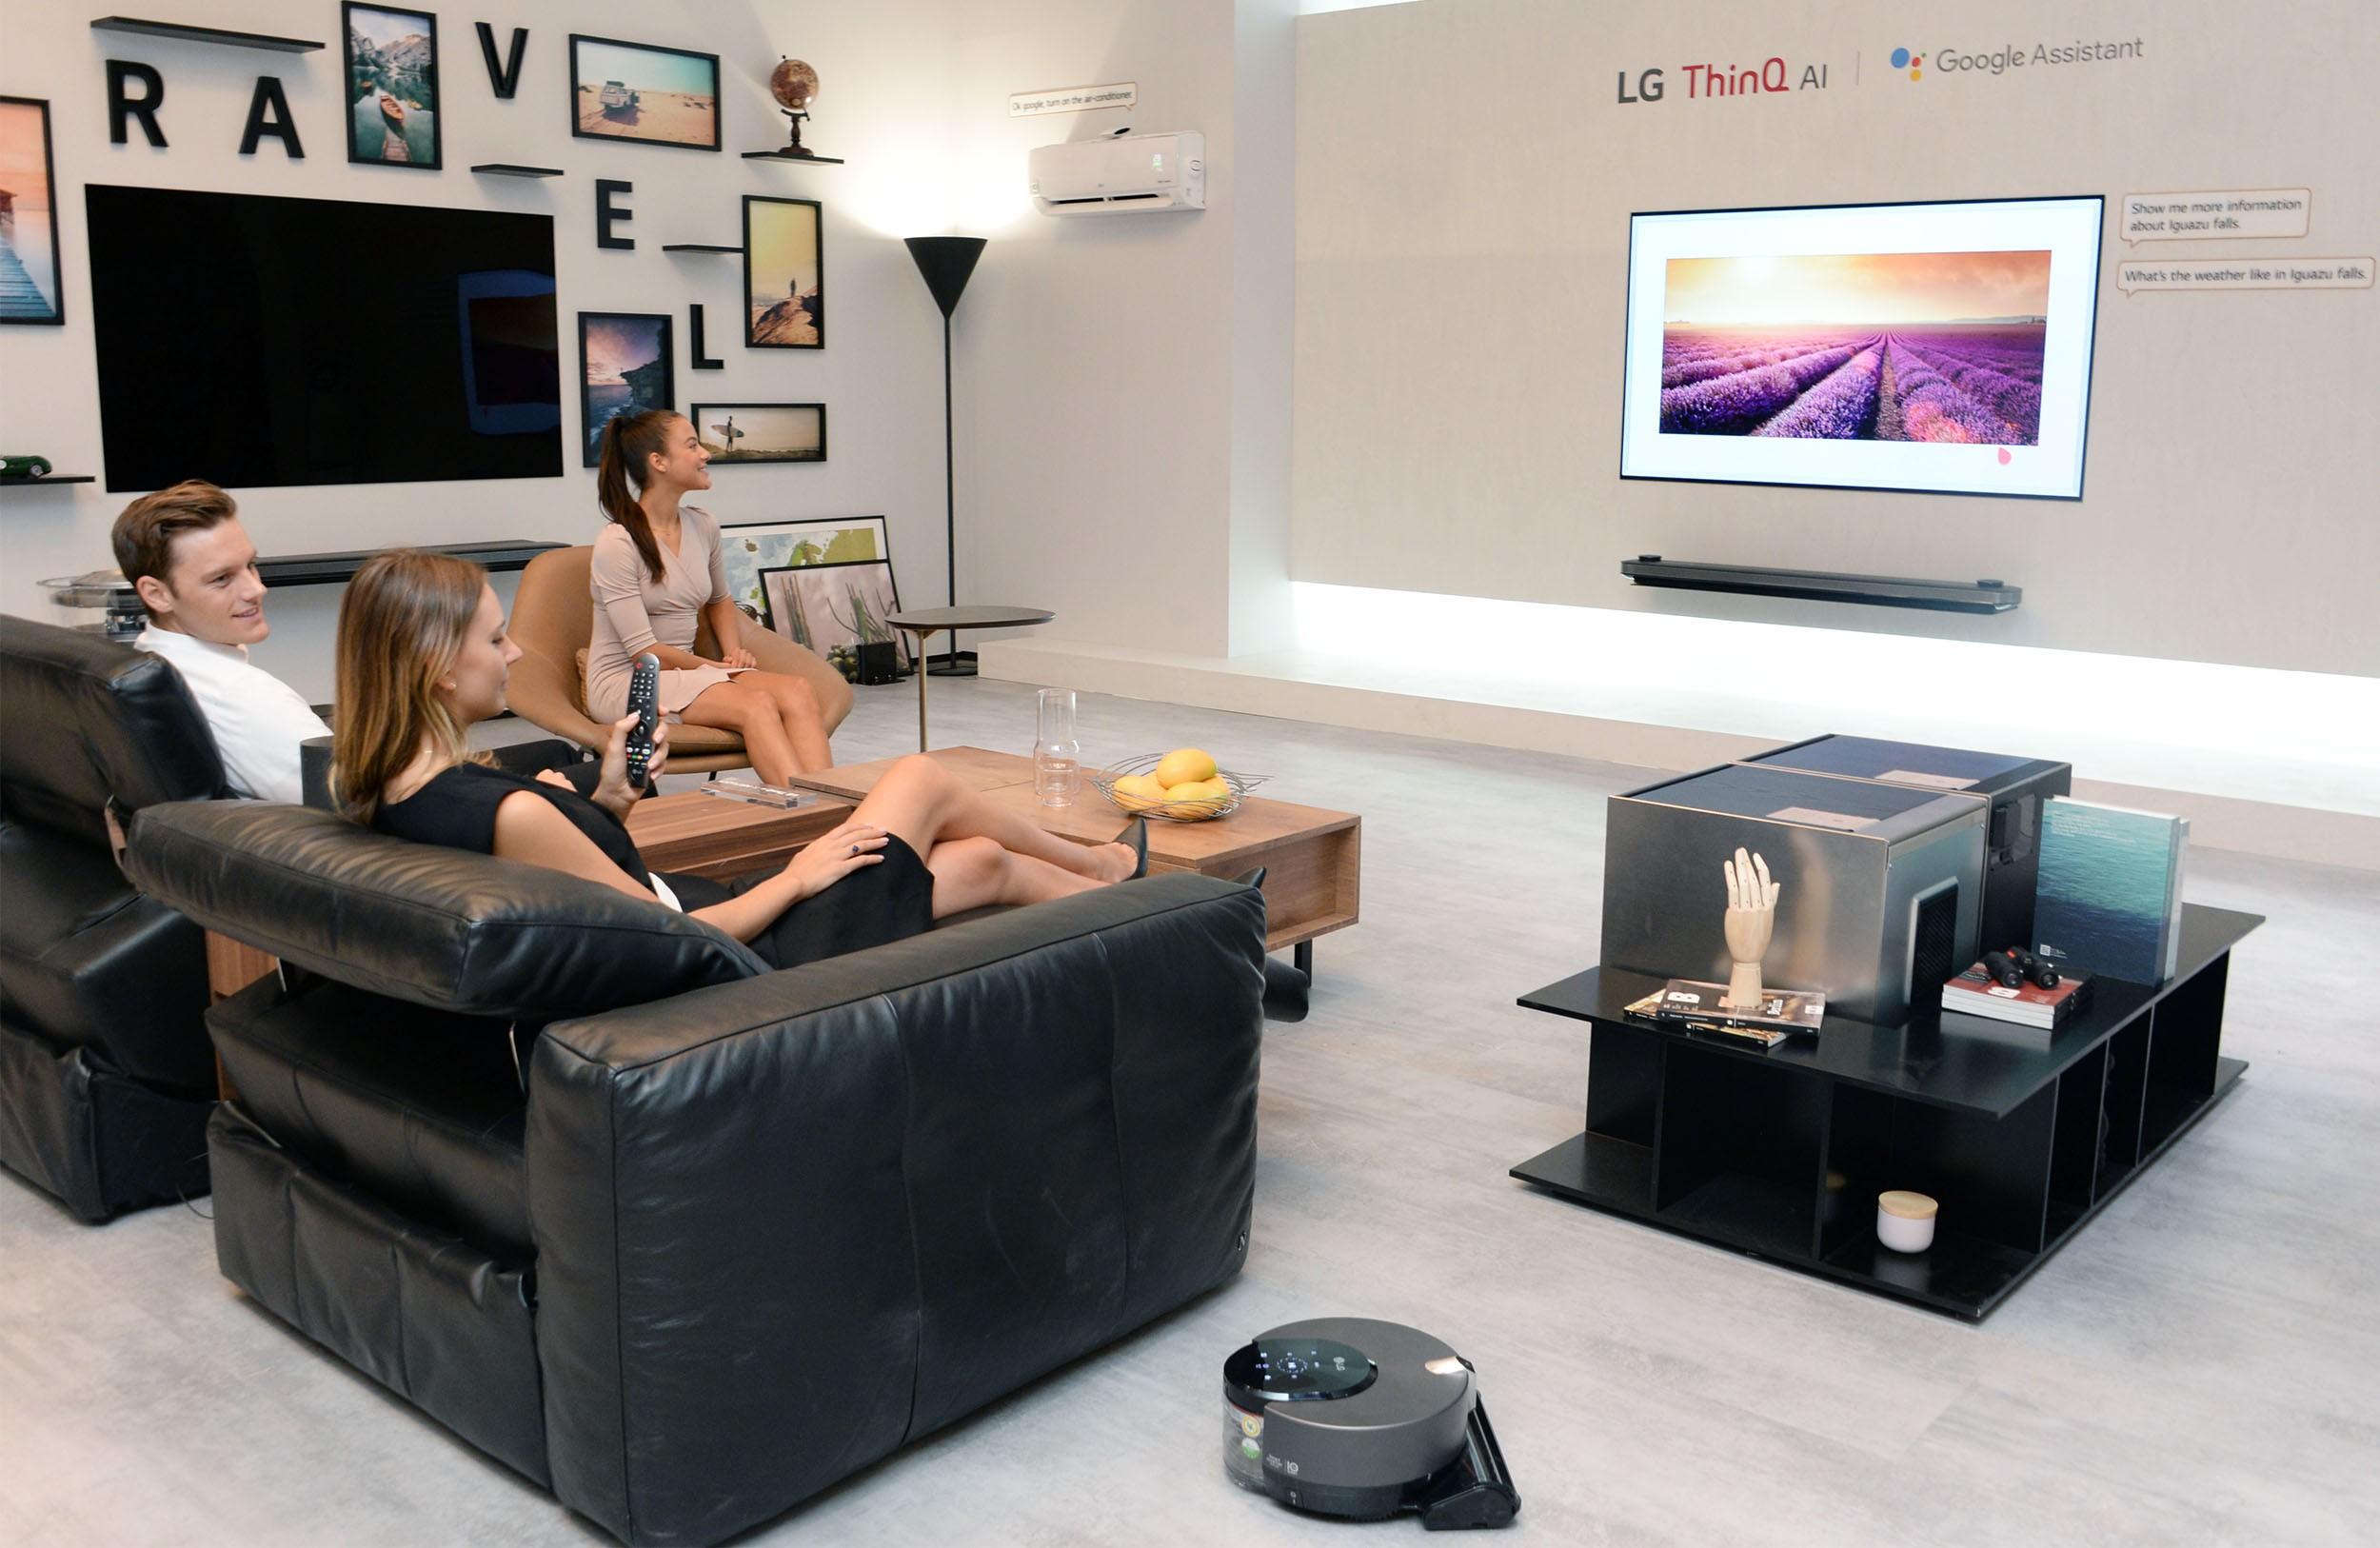 Models pose with LG ThinQ AI TV at the LG booth at IFA 2018.